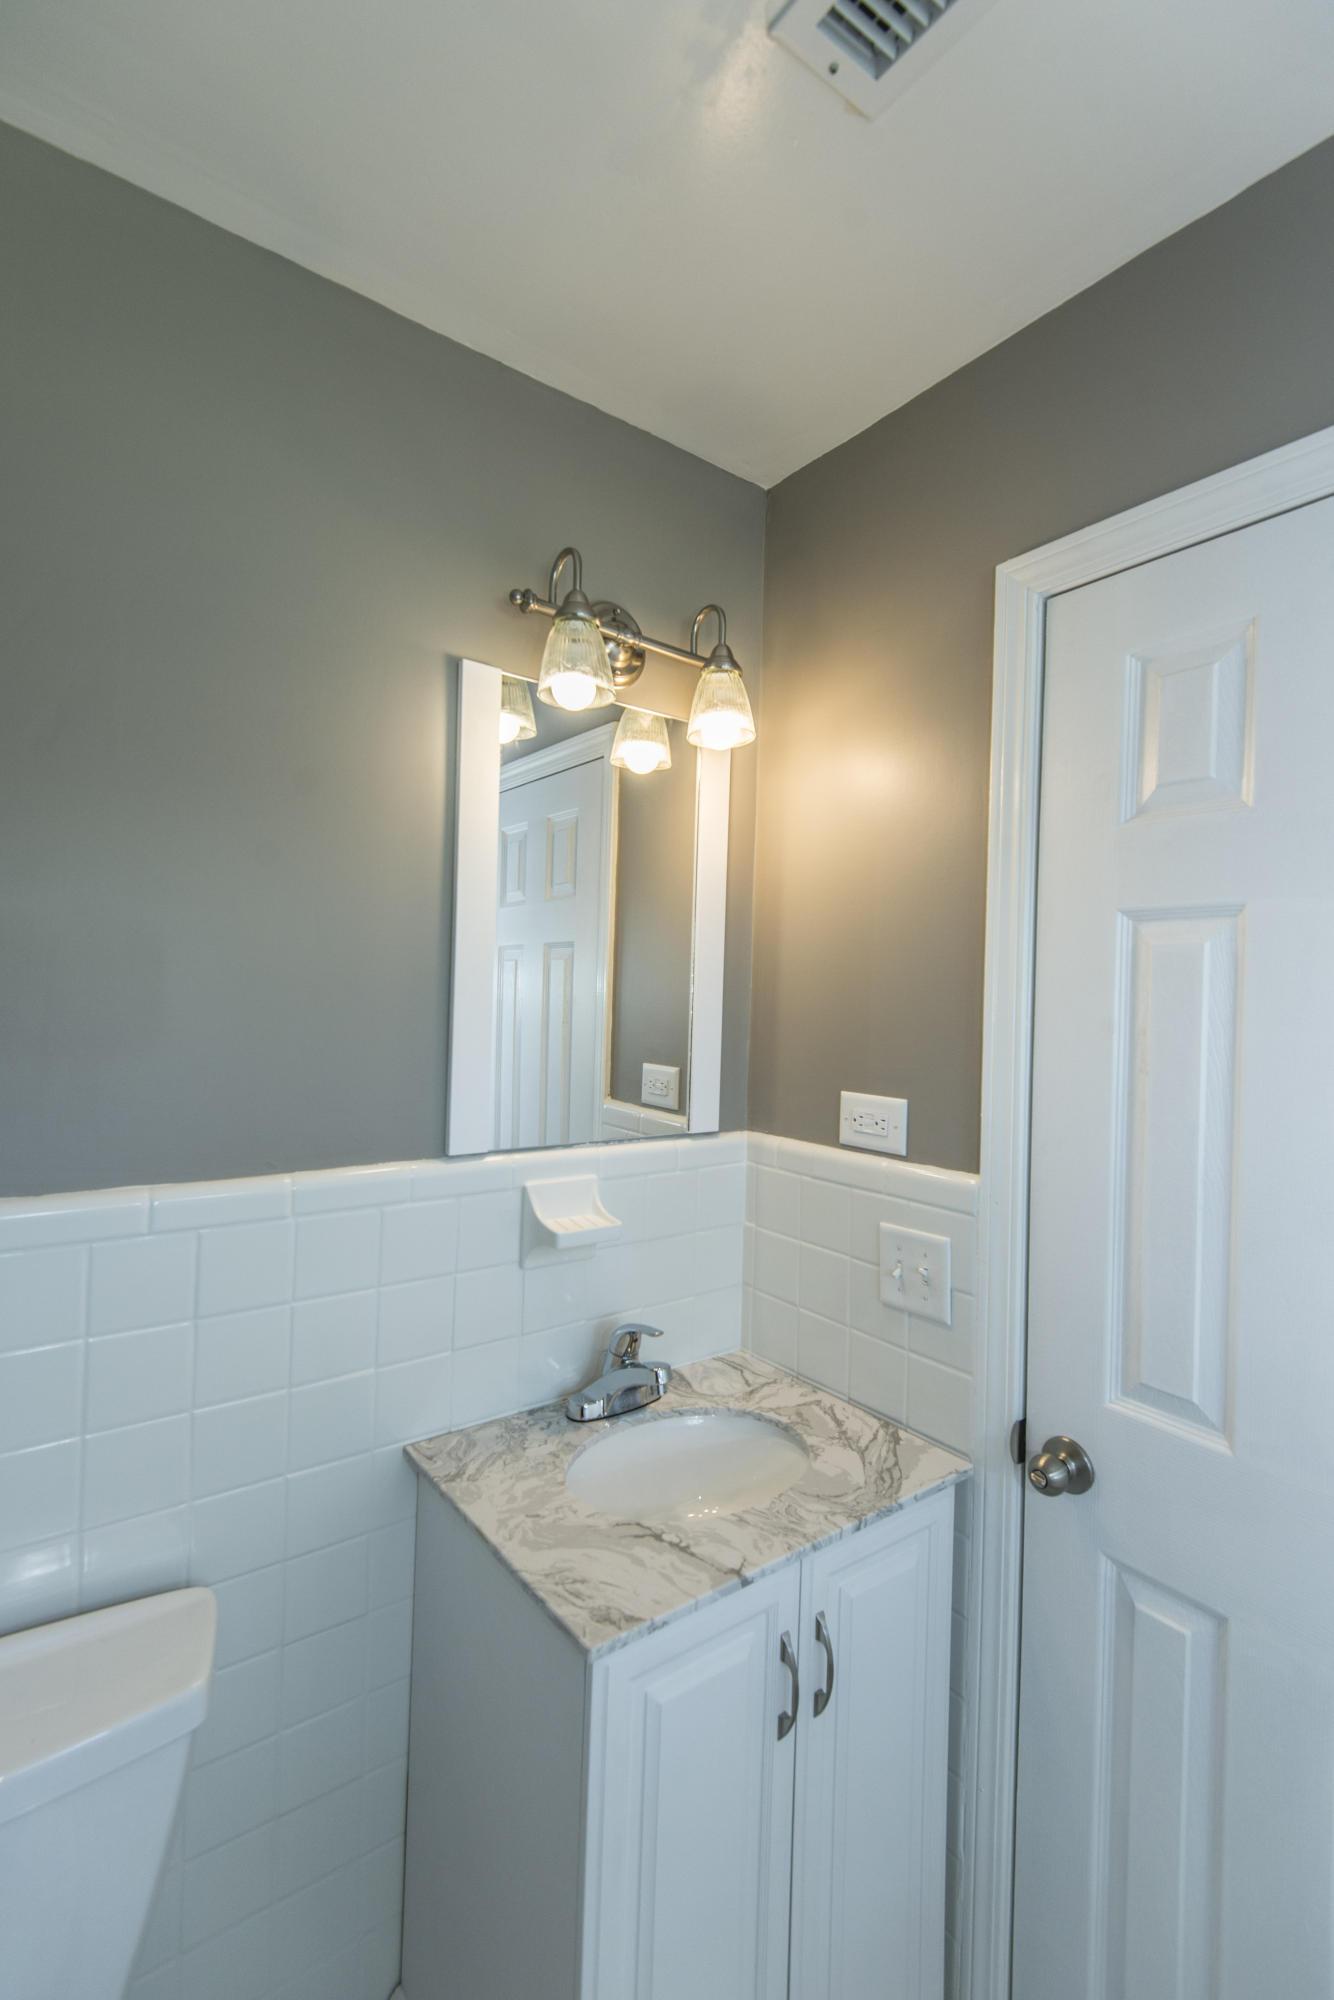 Washington Park Homes For Sale - 1337 5th, Charleston, SC - 3